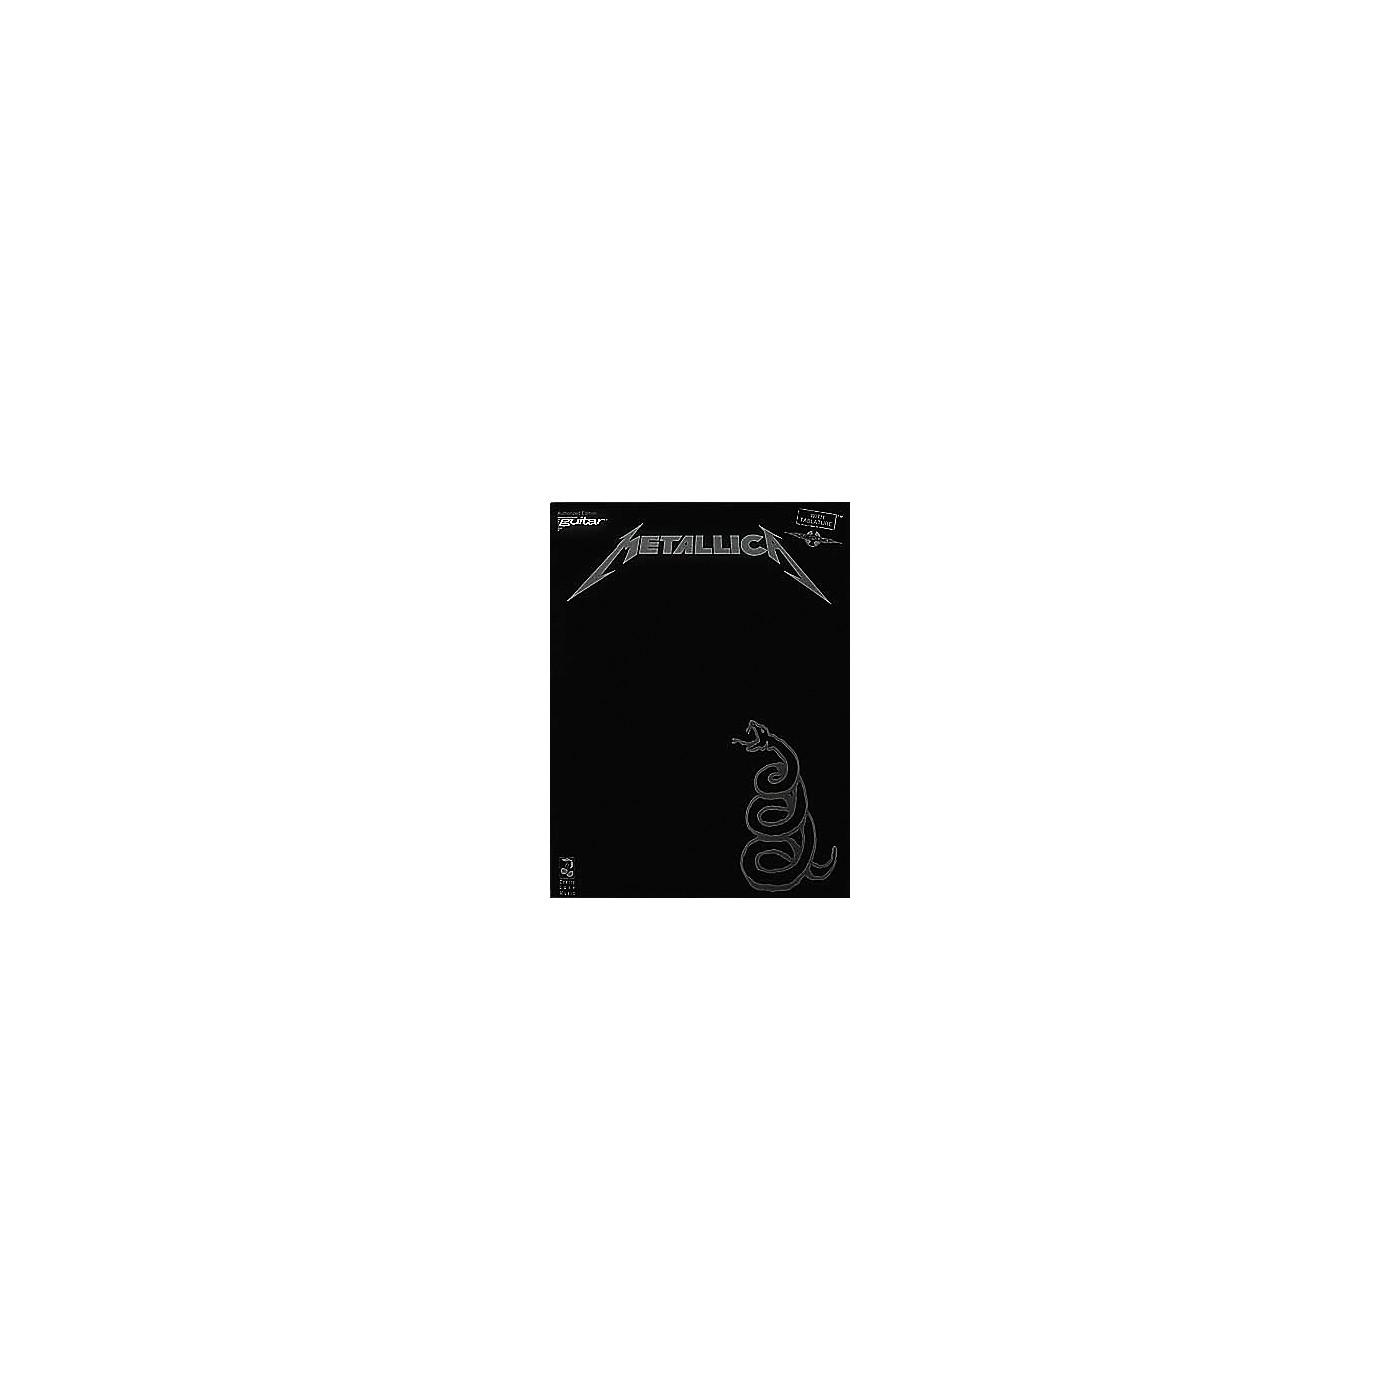 Hal Leonard Metallica The Black Album Guitar Tab Songbook thumbnail